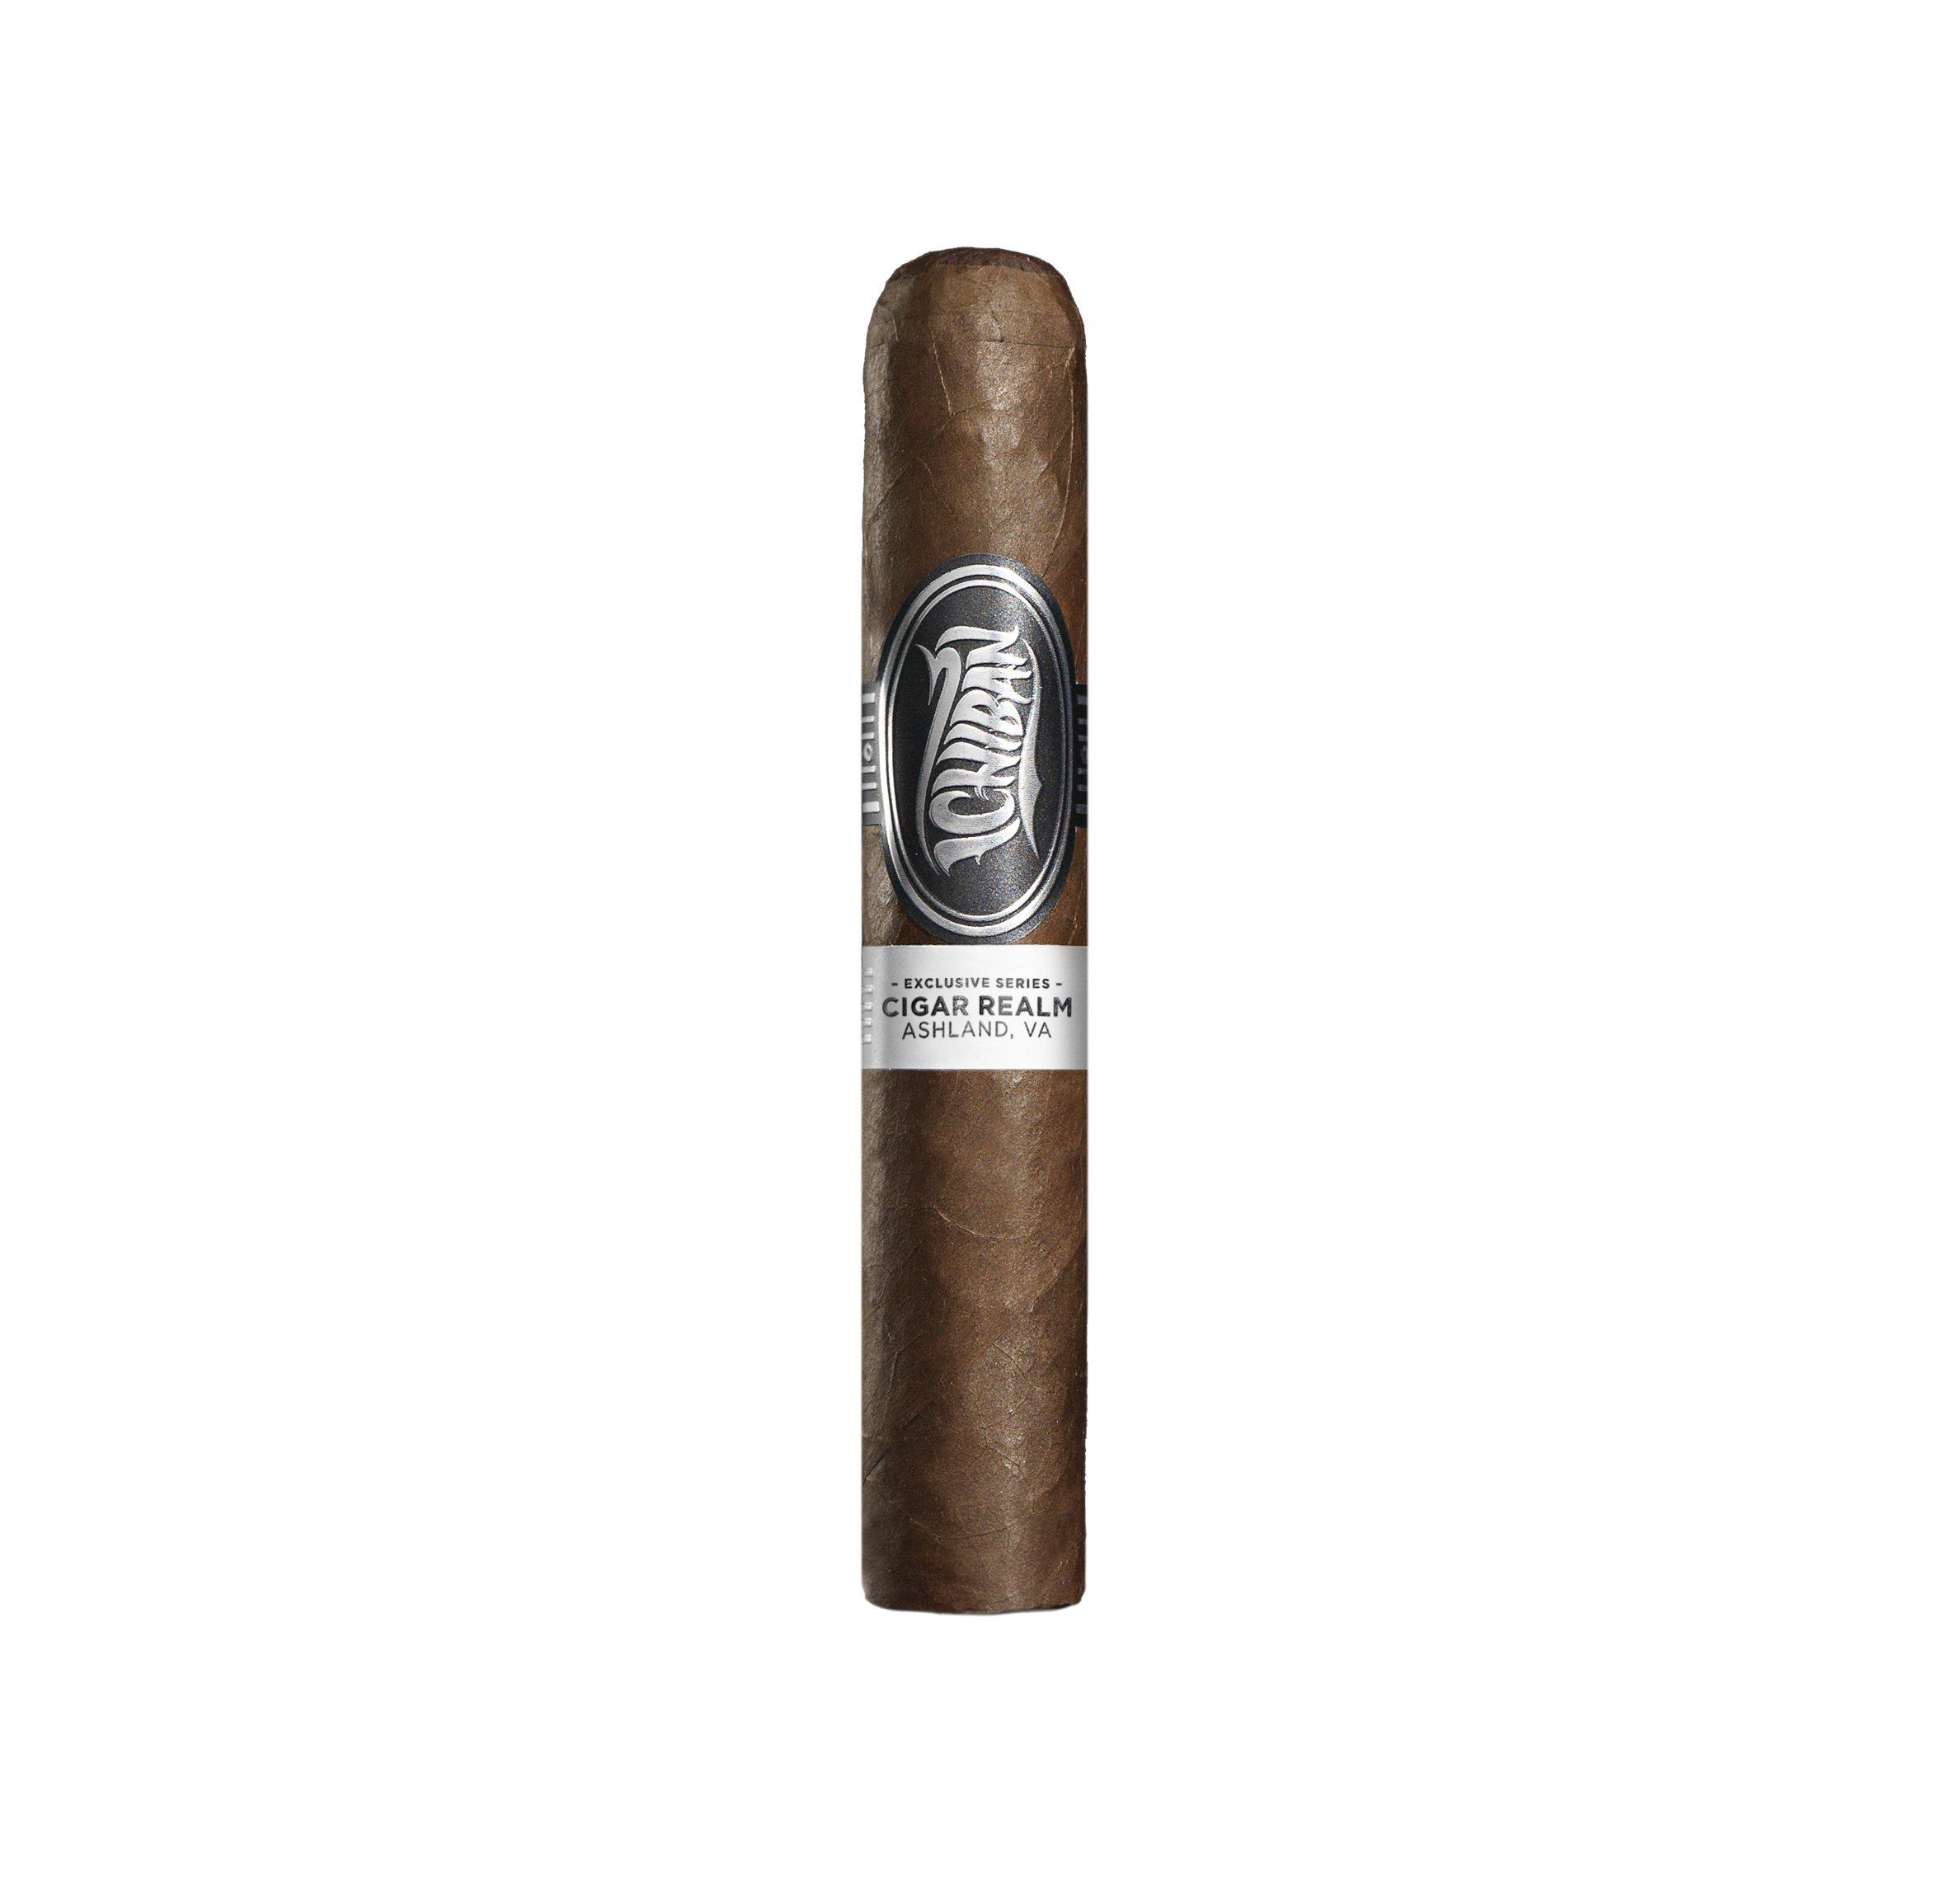 Cigar News: Room101 Ichiban Exclusive Headed to Cigar Realm in Ashland, VA